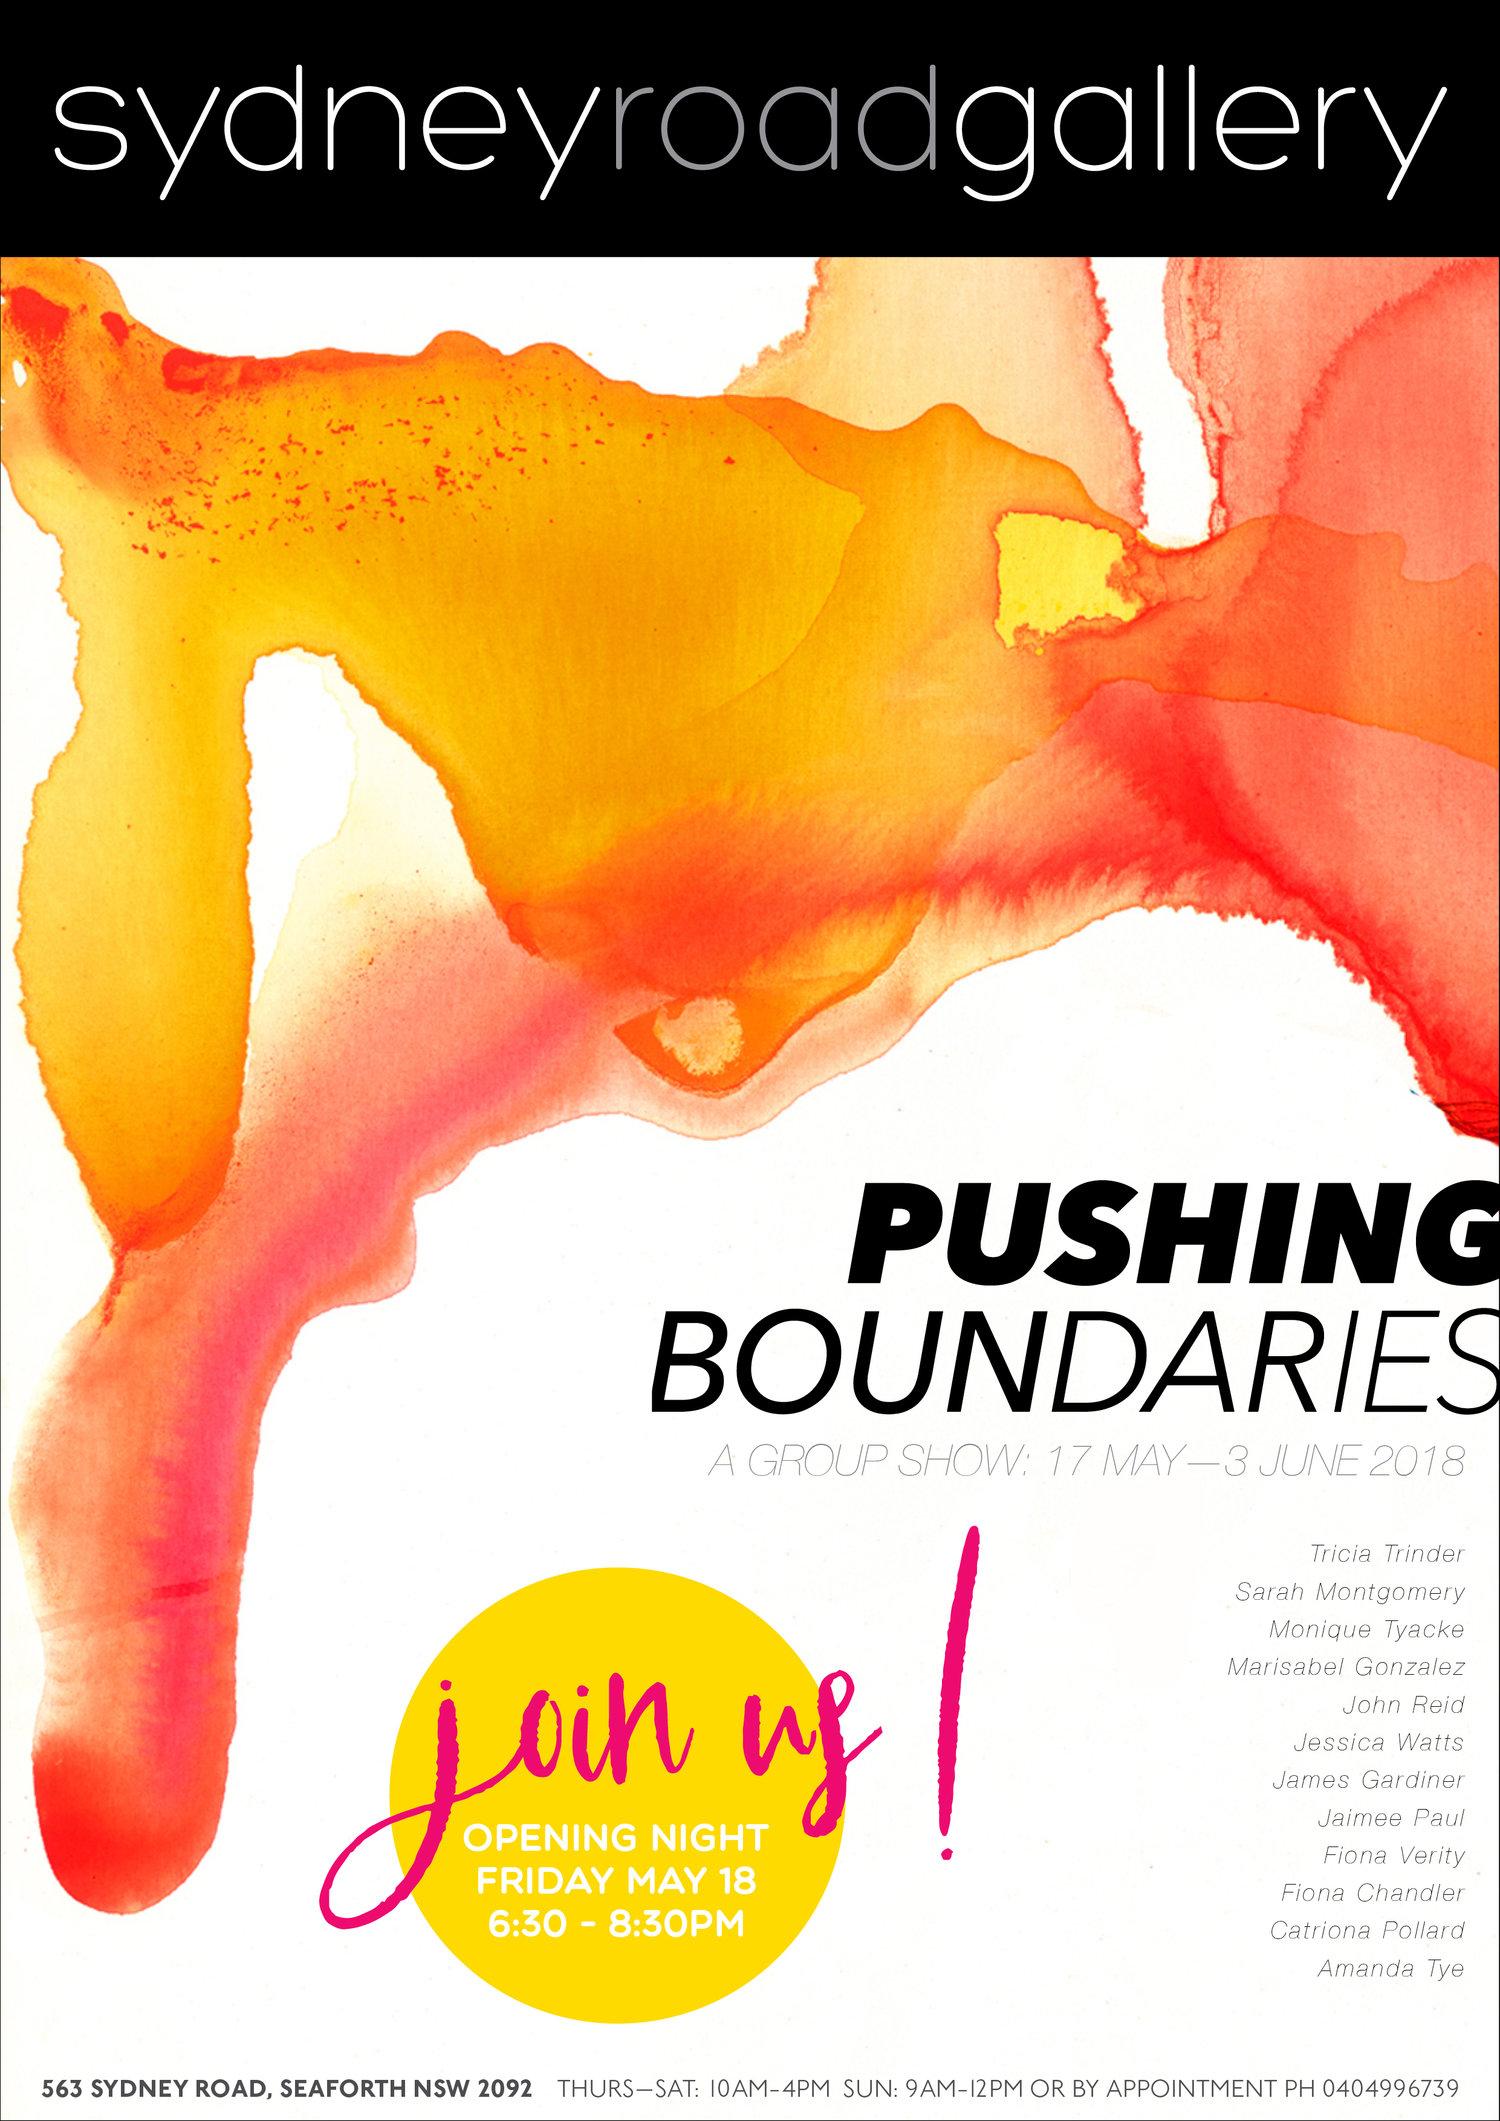 Pushing boundaries - A Group Show